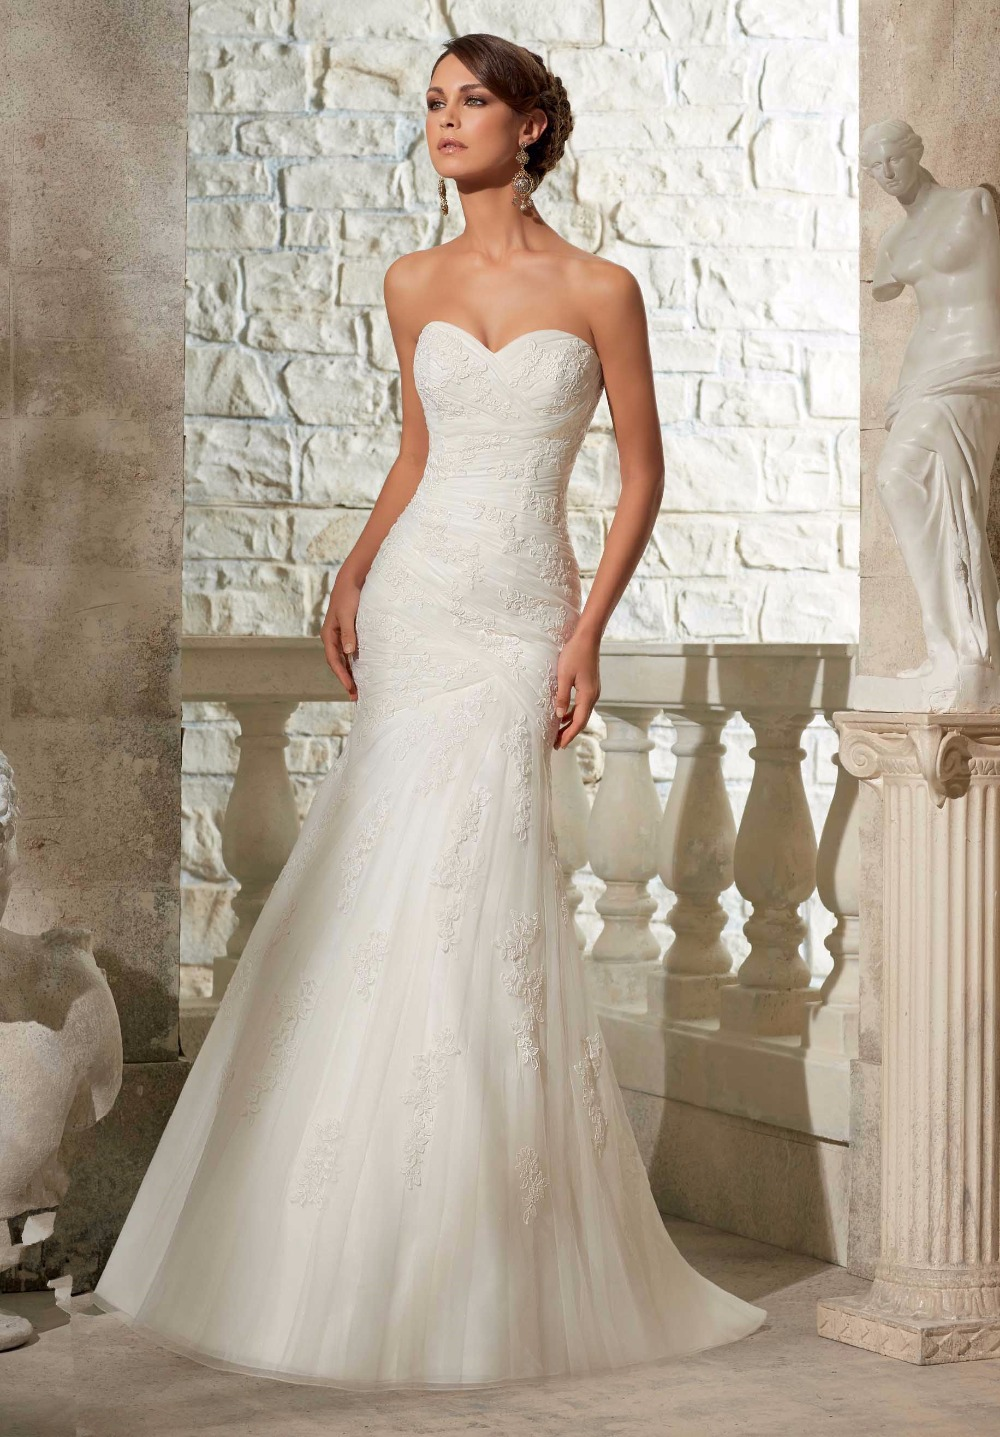 Sweetheart neckline lovely type fishtail wedding dress collocation ...